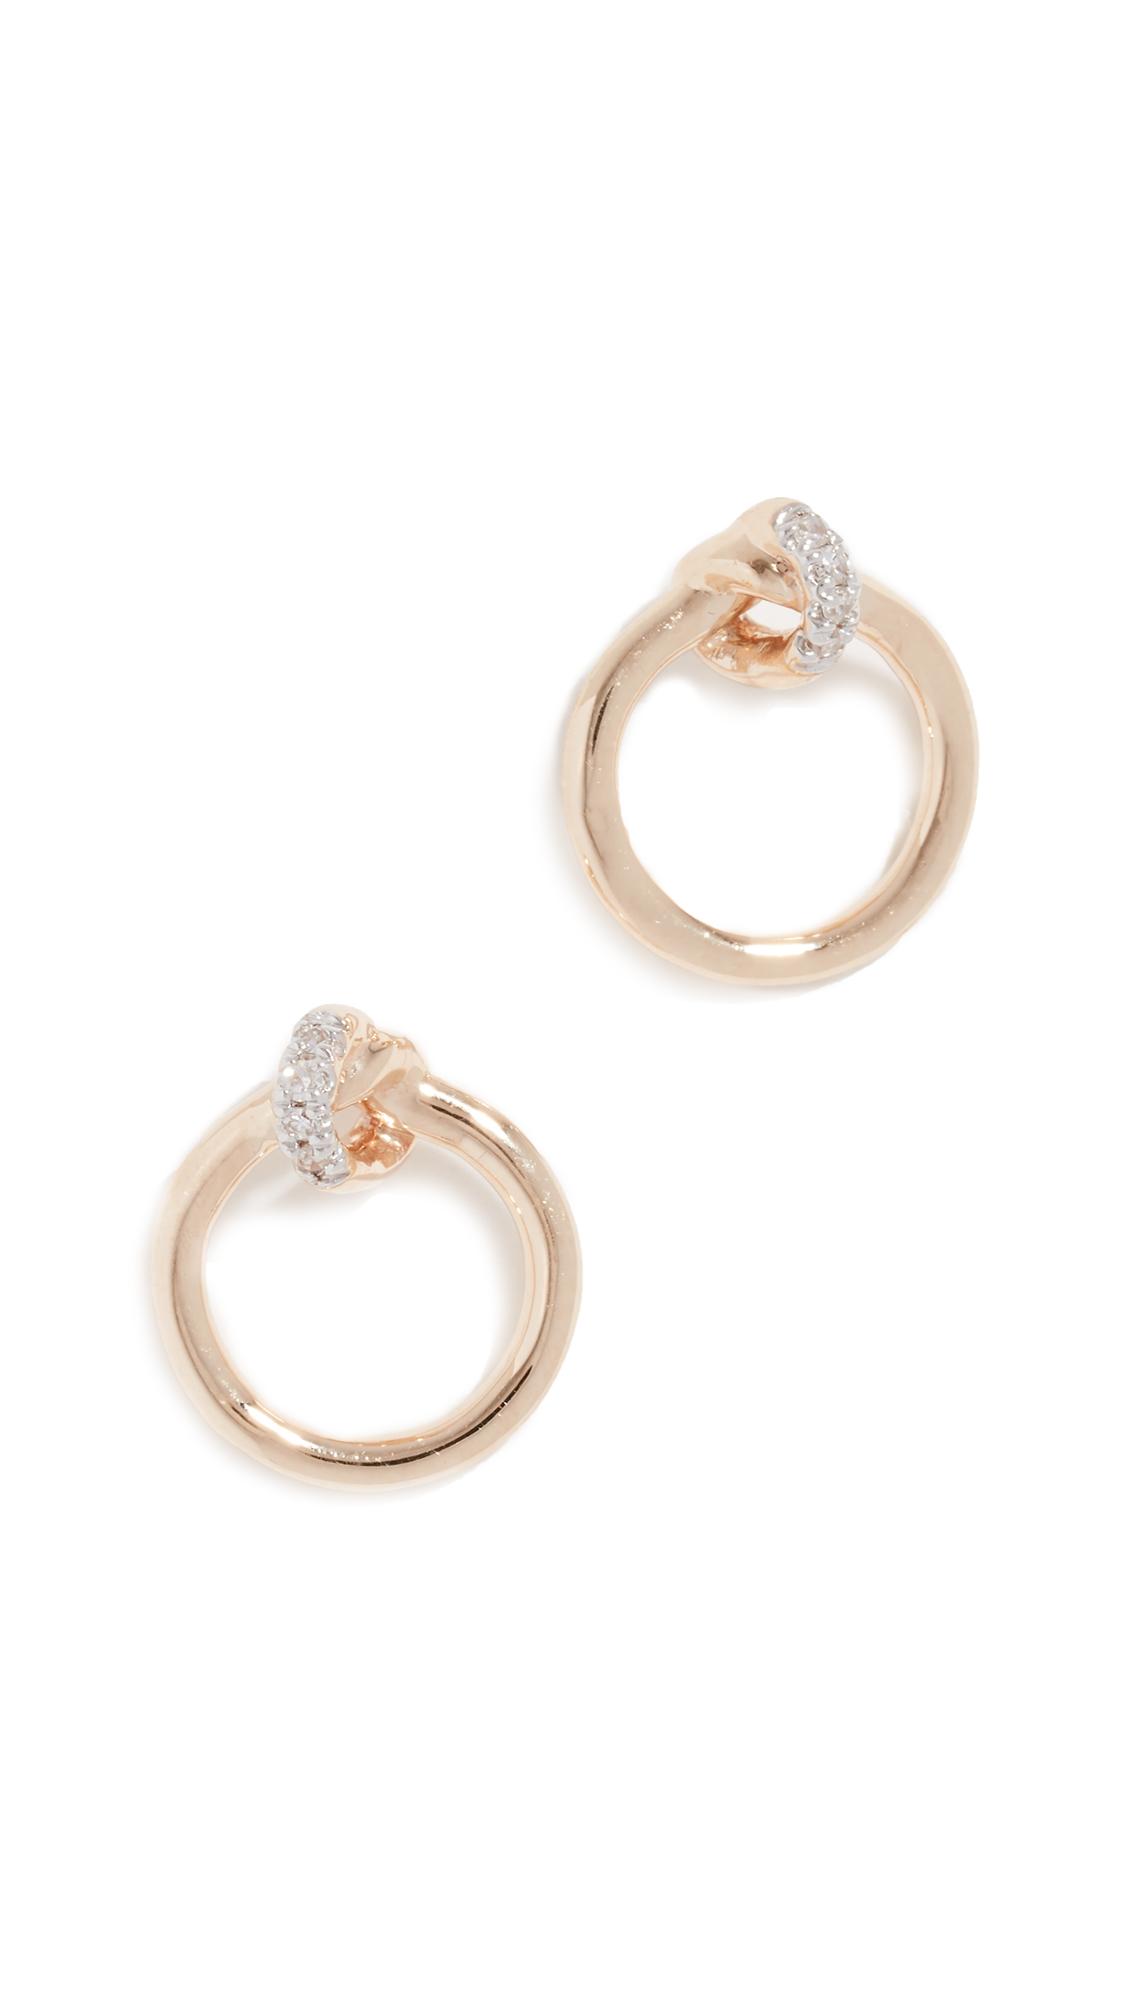 ADINA REYTER 14K Diamond Pave Loop Post Earrings in Yellow Gold